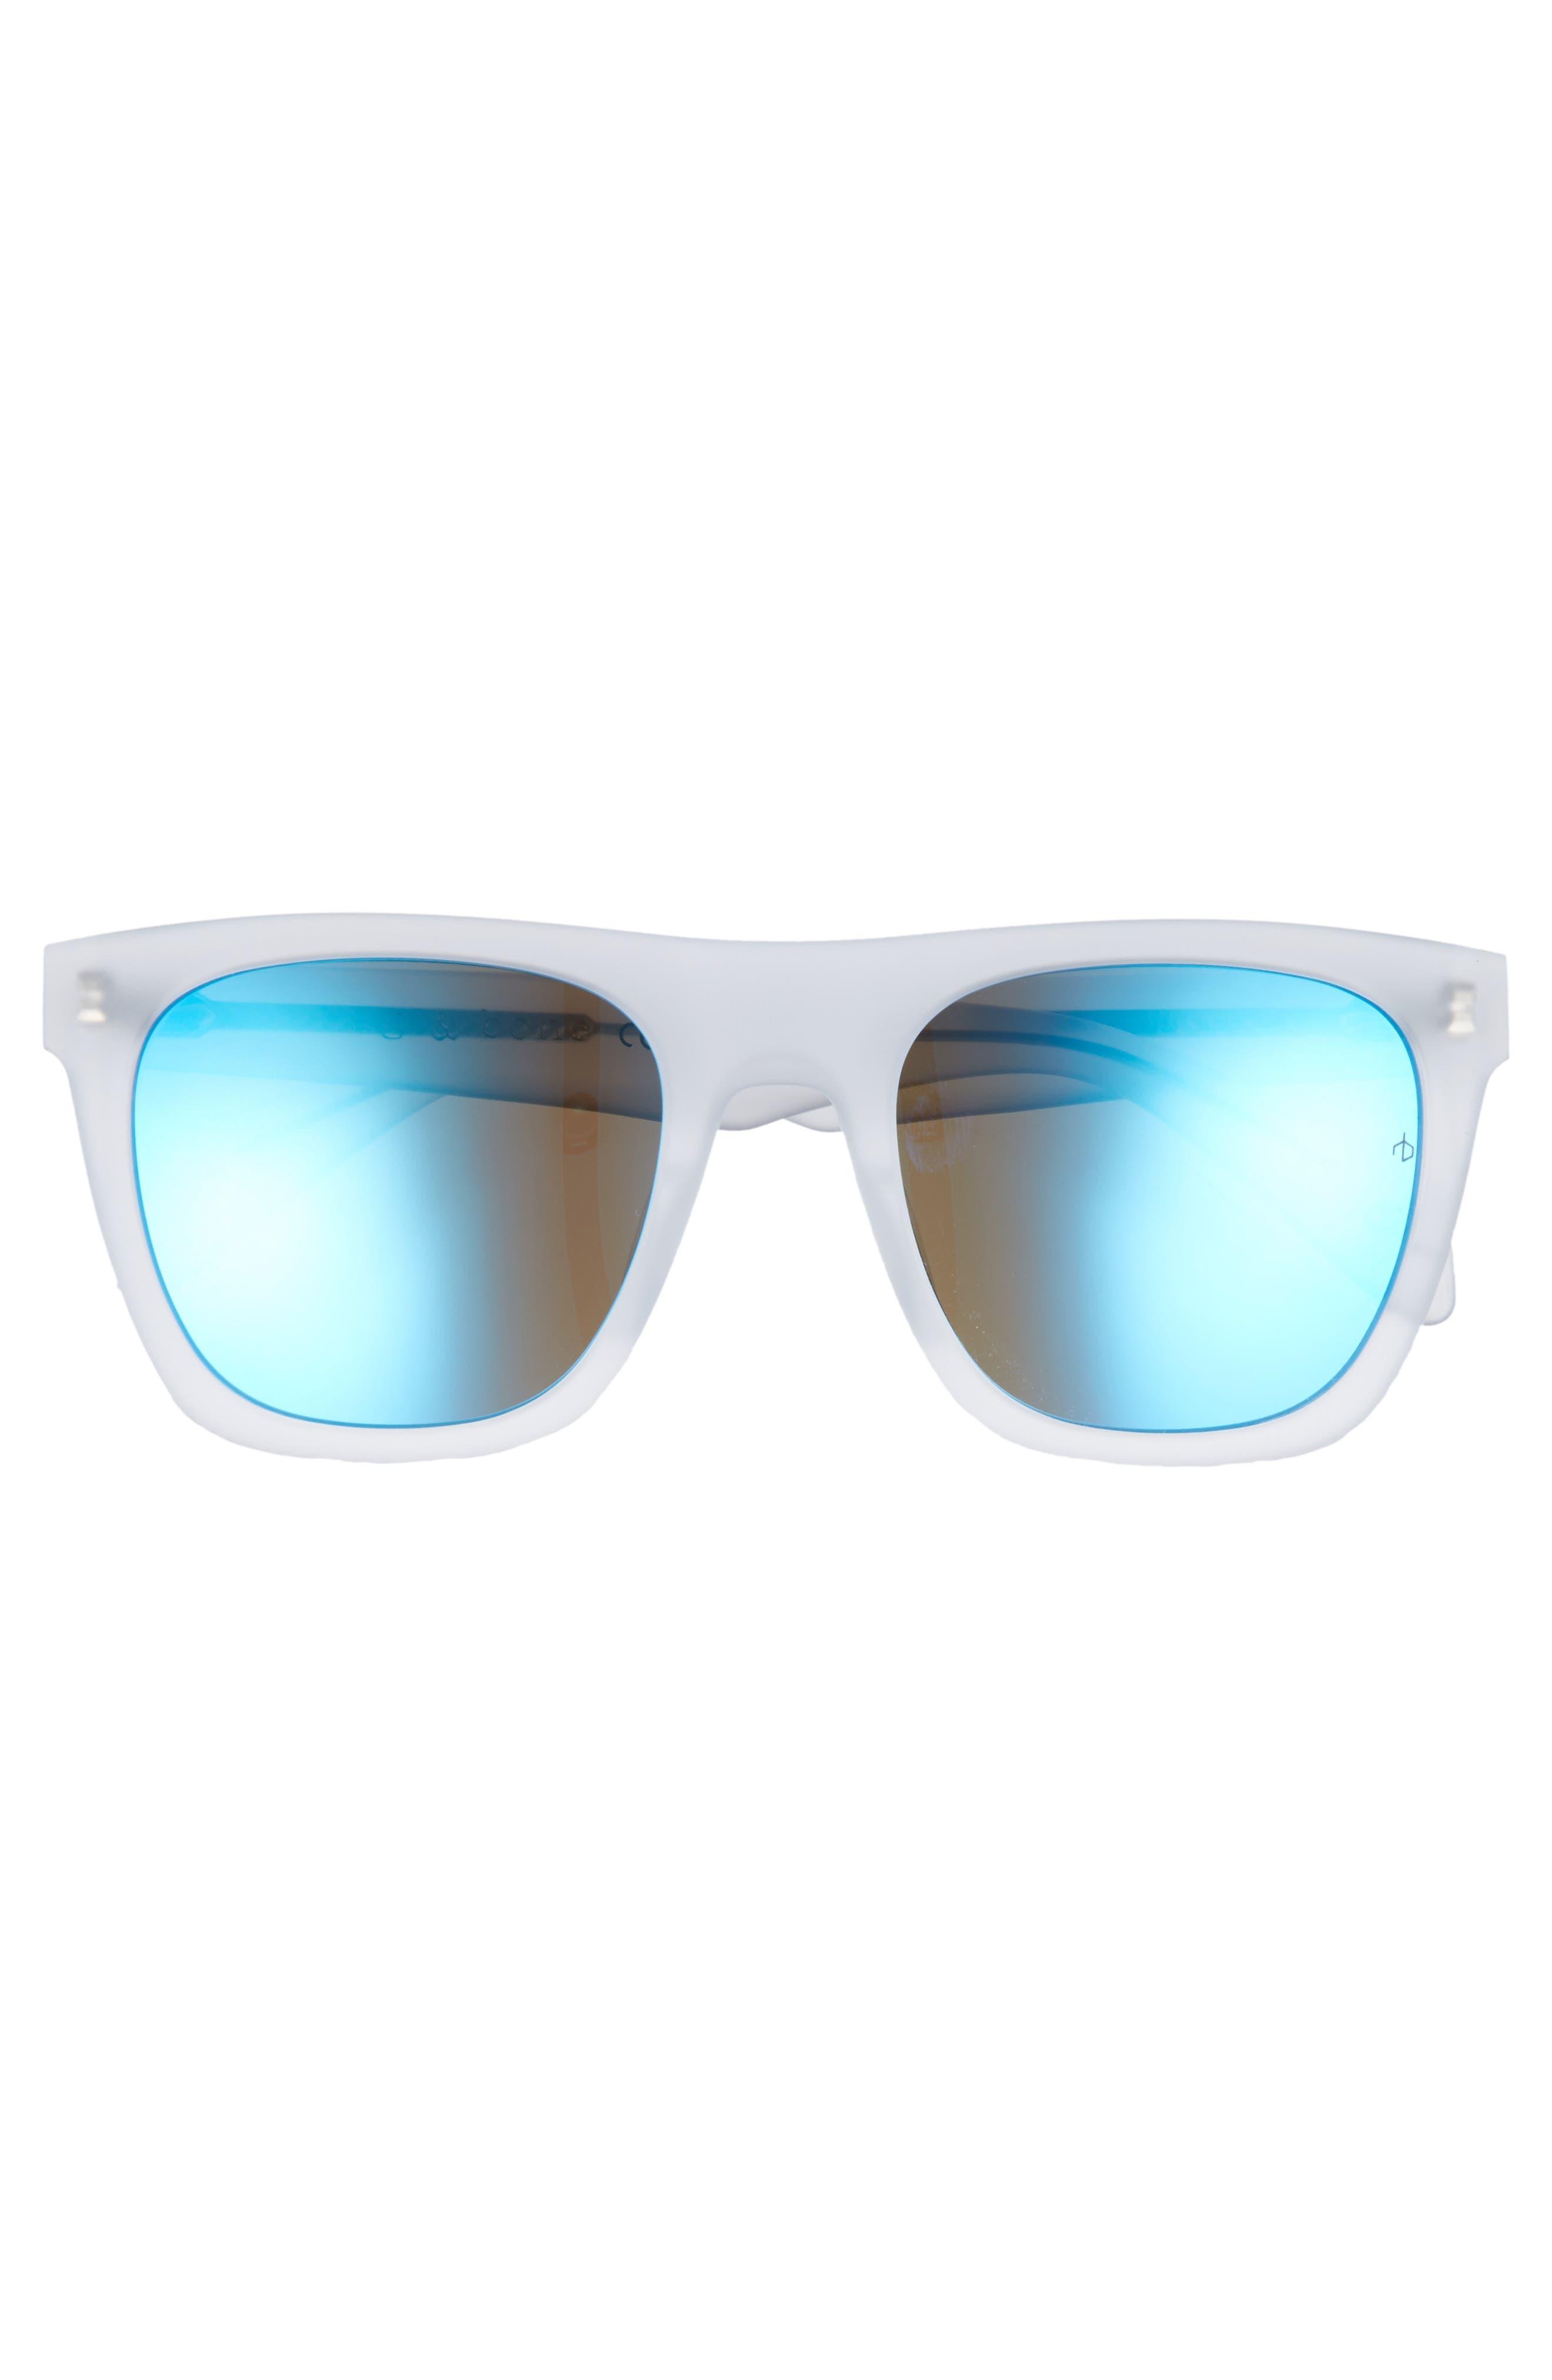 54mm Polarized Sunglasses,                             Alternate thumbnail 2, color,                             Matte Crystal